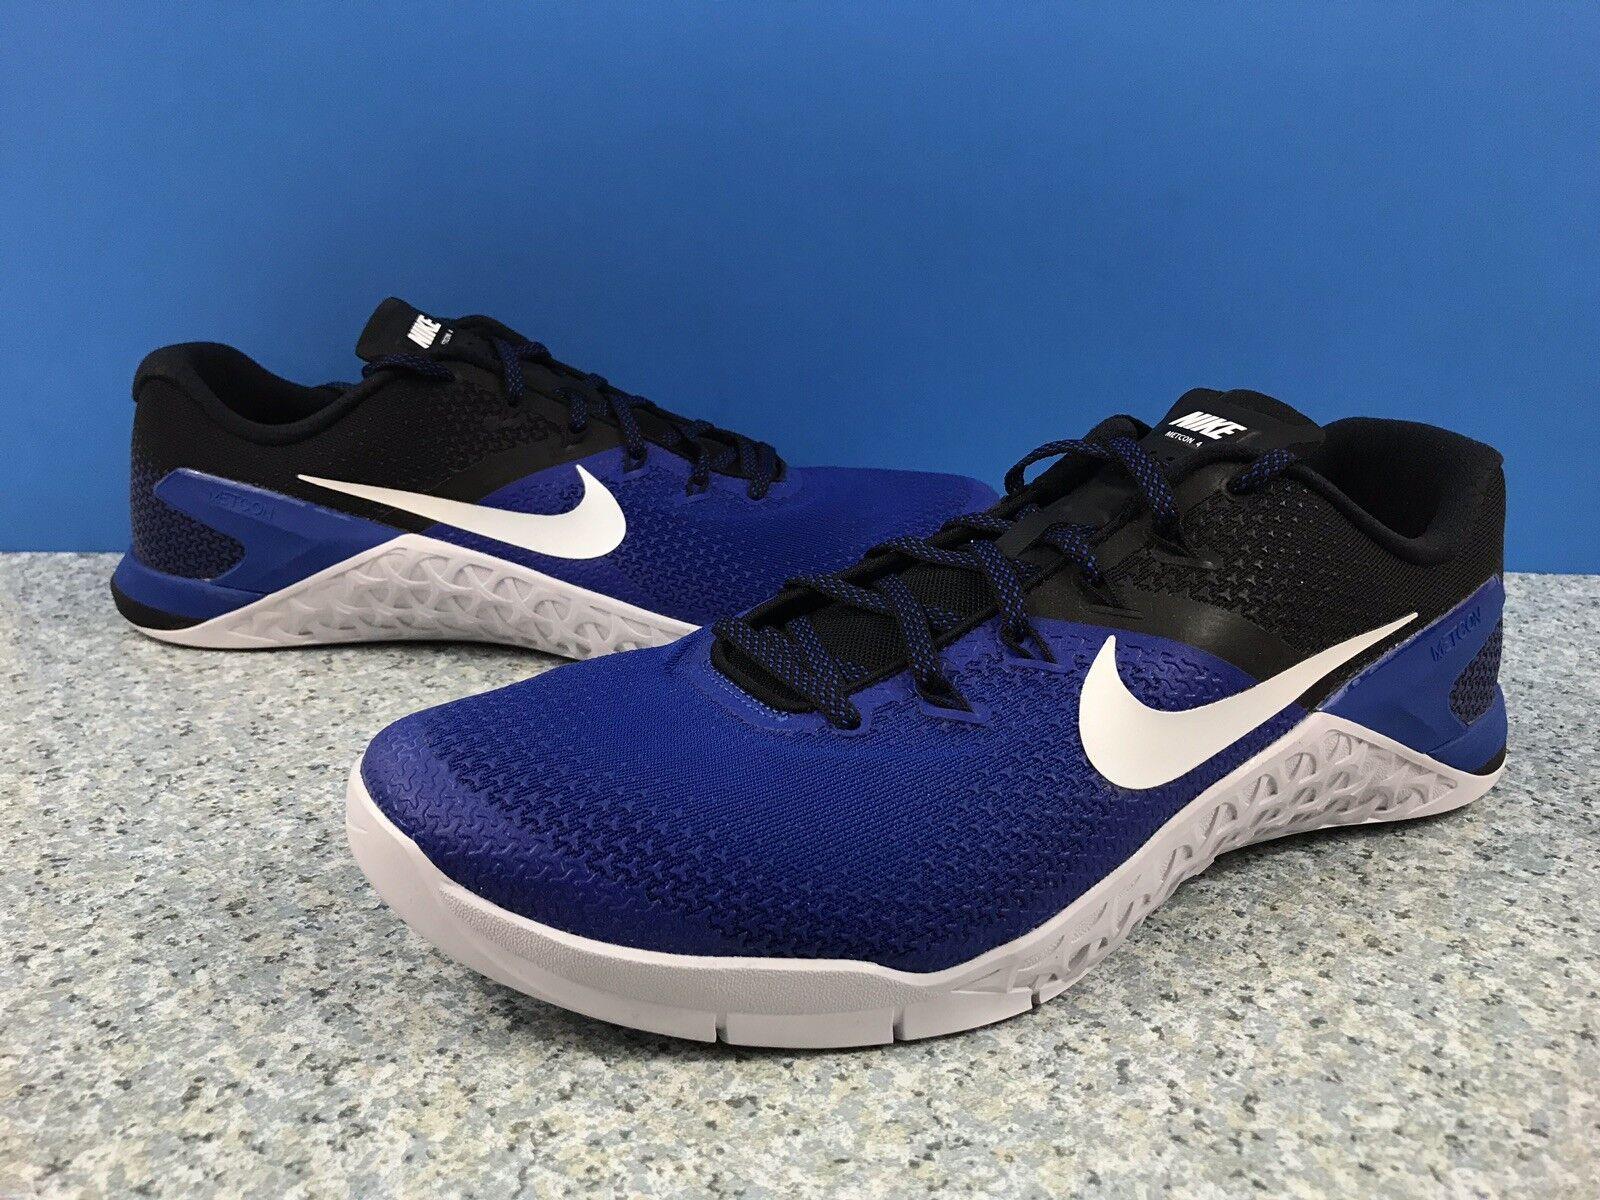 Nike Metcon 4 Training shoes Game Royal White Black AH7453-410 Men's Sz 14